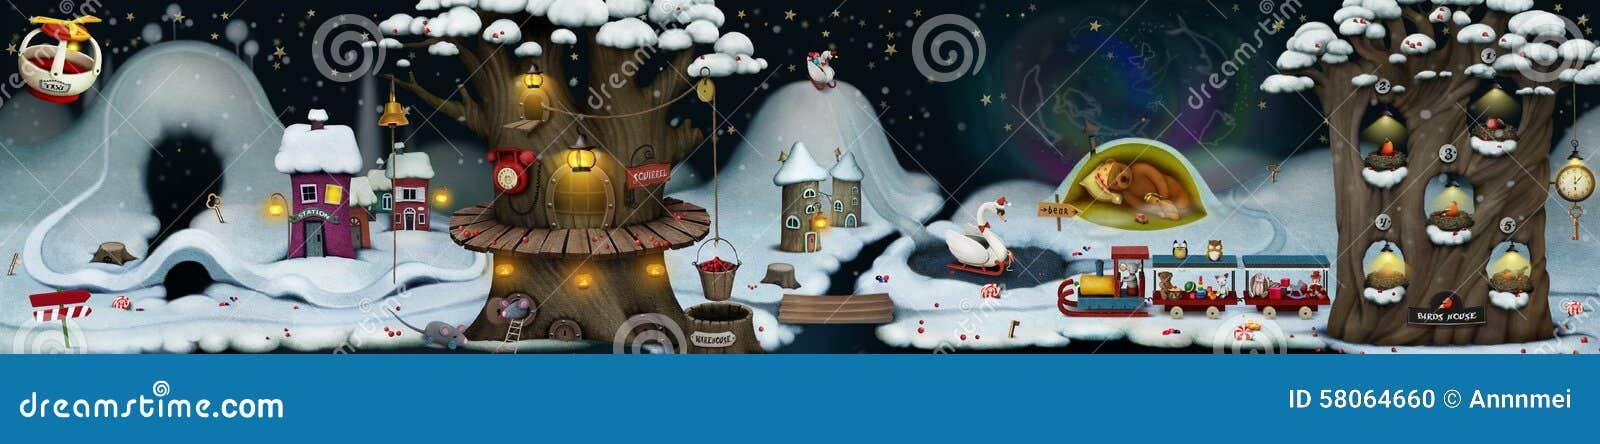 Fairy winter night